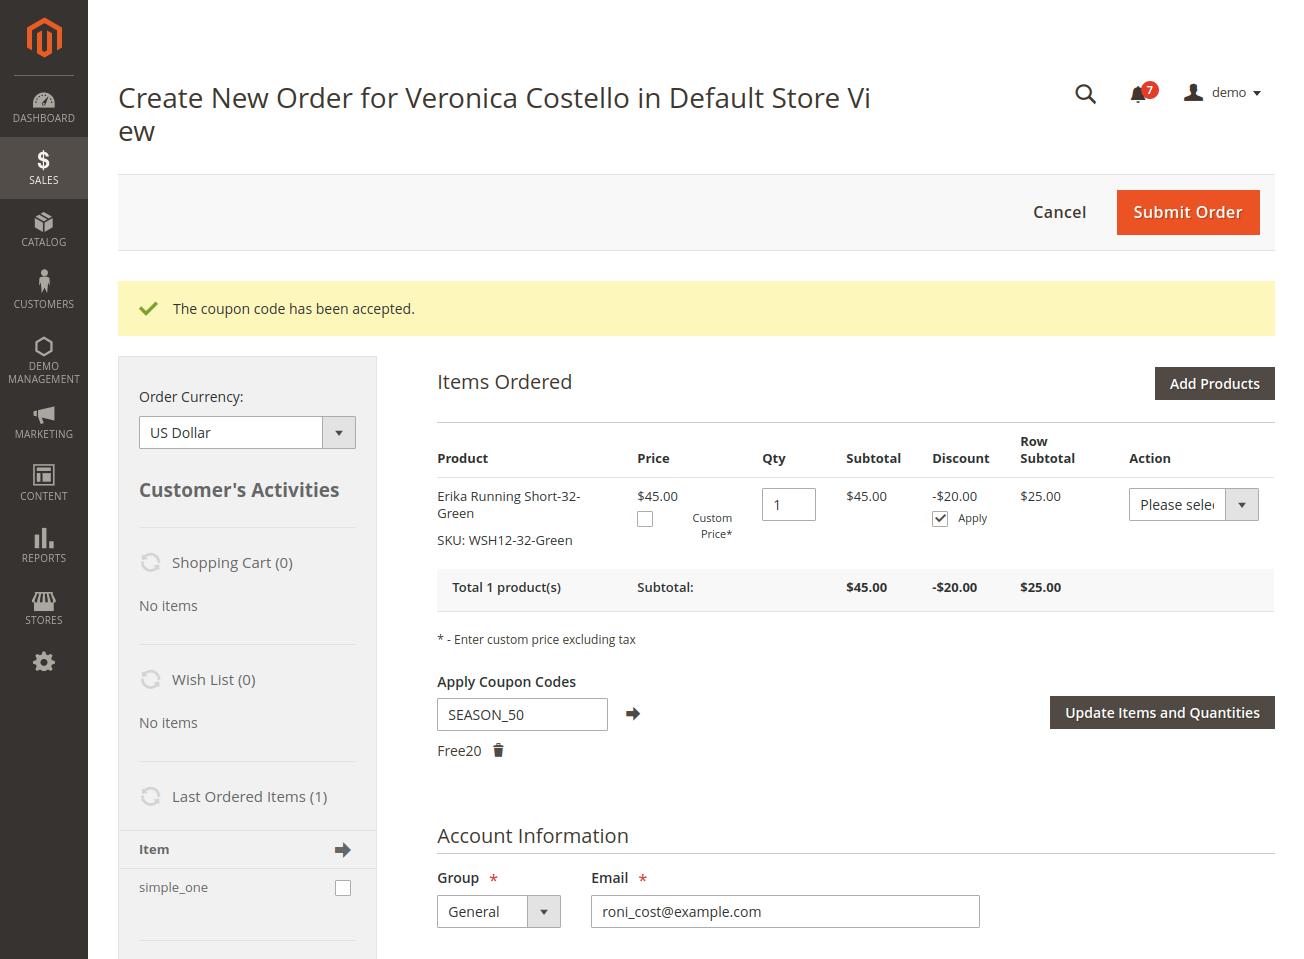 webkul-magento2-multiple-coupon-codes-admin-order